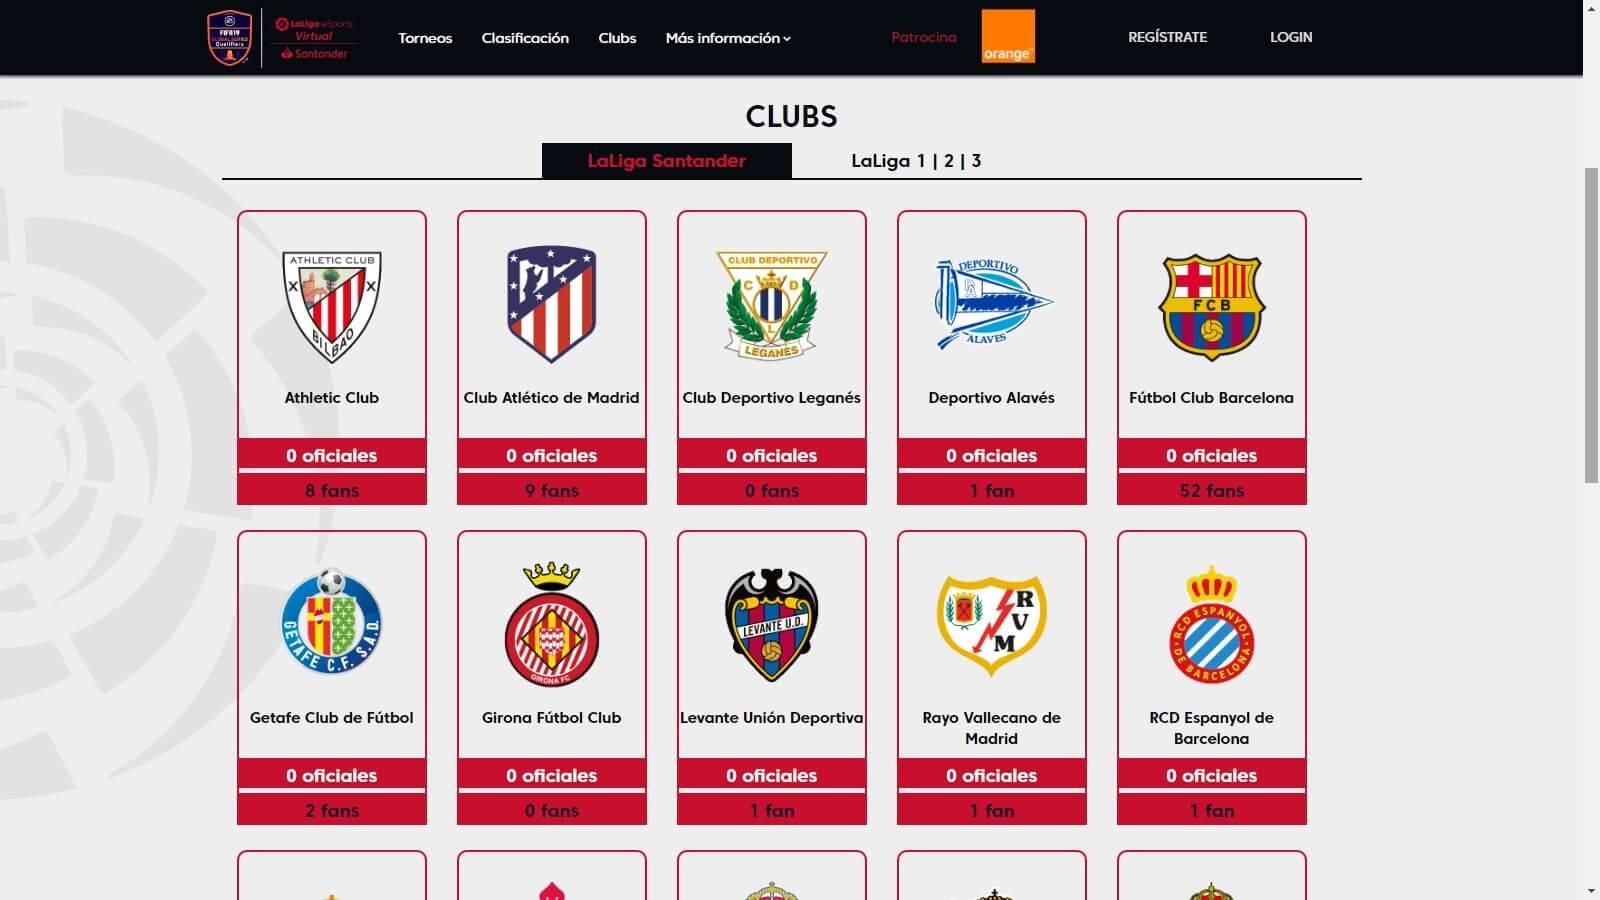 Club partecipanti al torneo La Liga Santander eSports